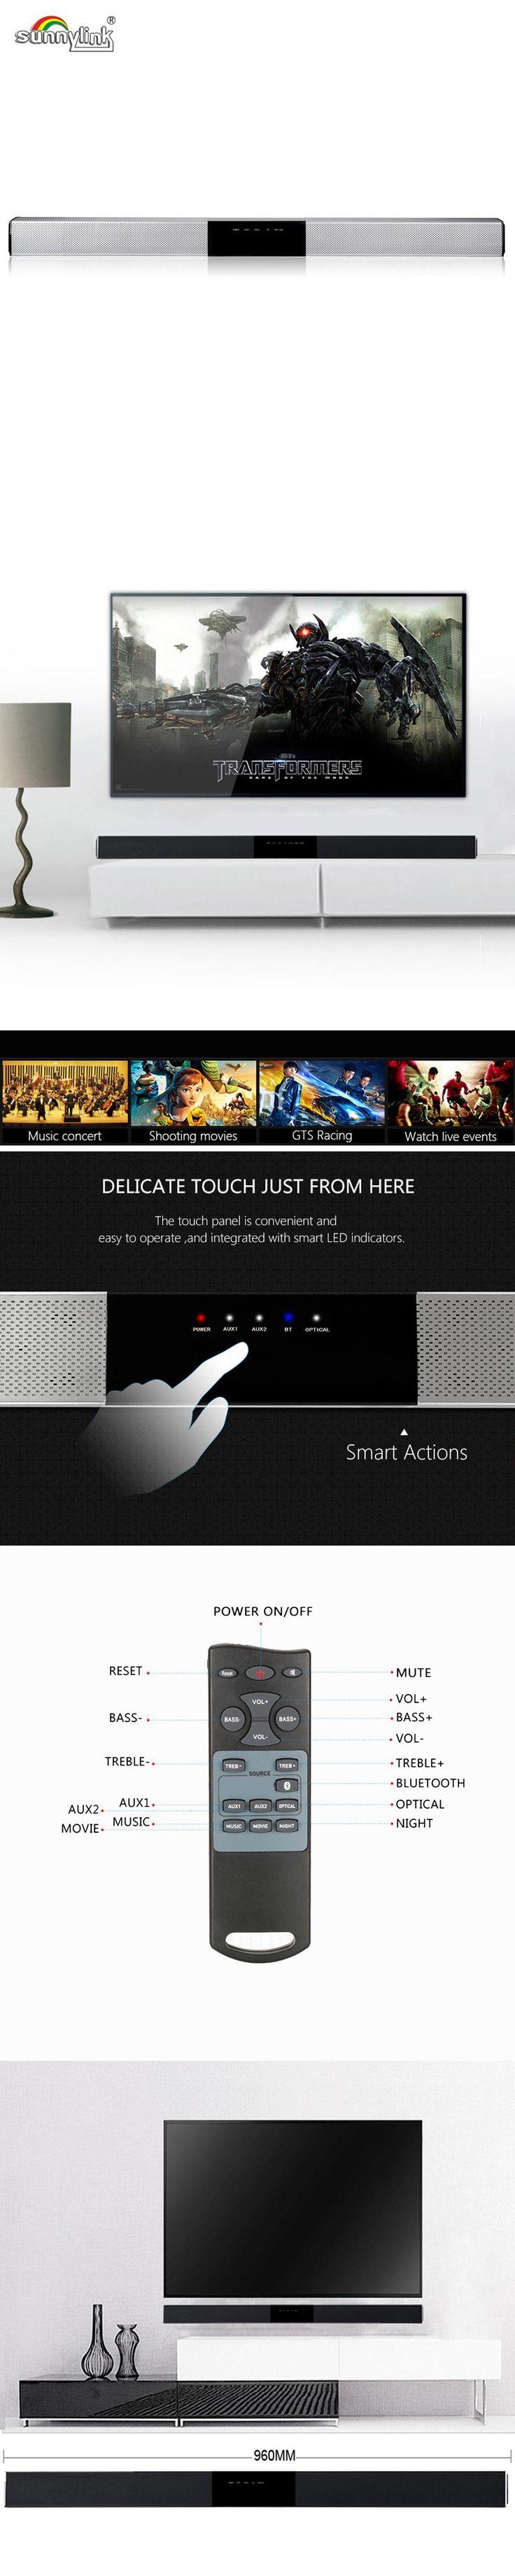 ULTRA SLIM  TV SOUNDBAR/SOUND BAR SPEAKER , BLUETOOTH 4.0 , POWERFUL BASS AND 3D SURROUND SOUND , HI-FI SMART TV /PC SPEAKER